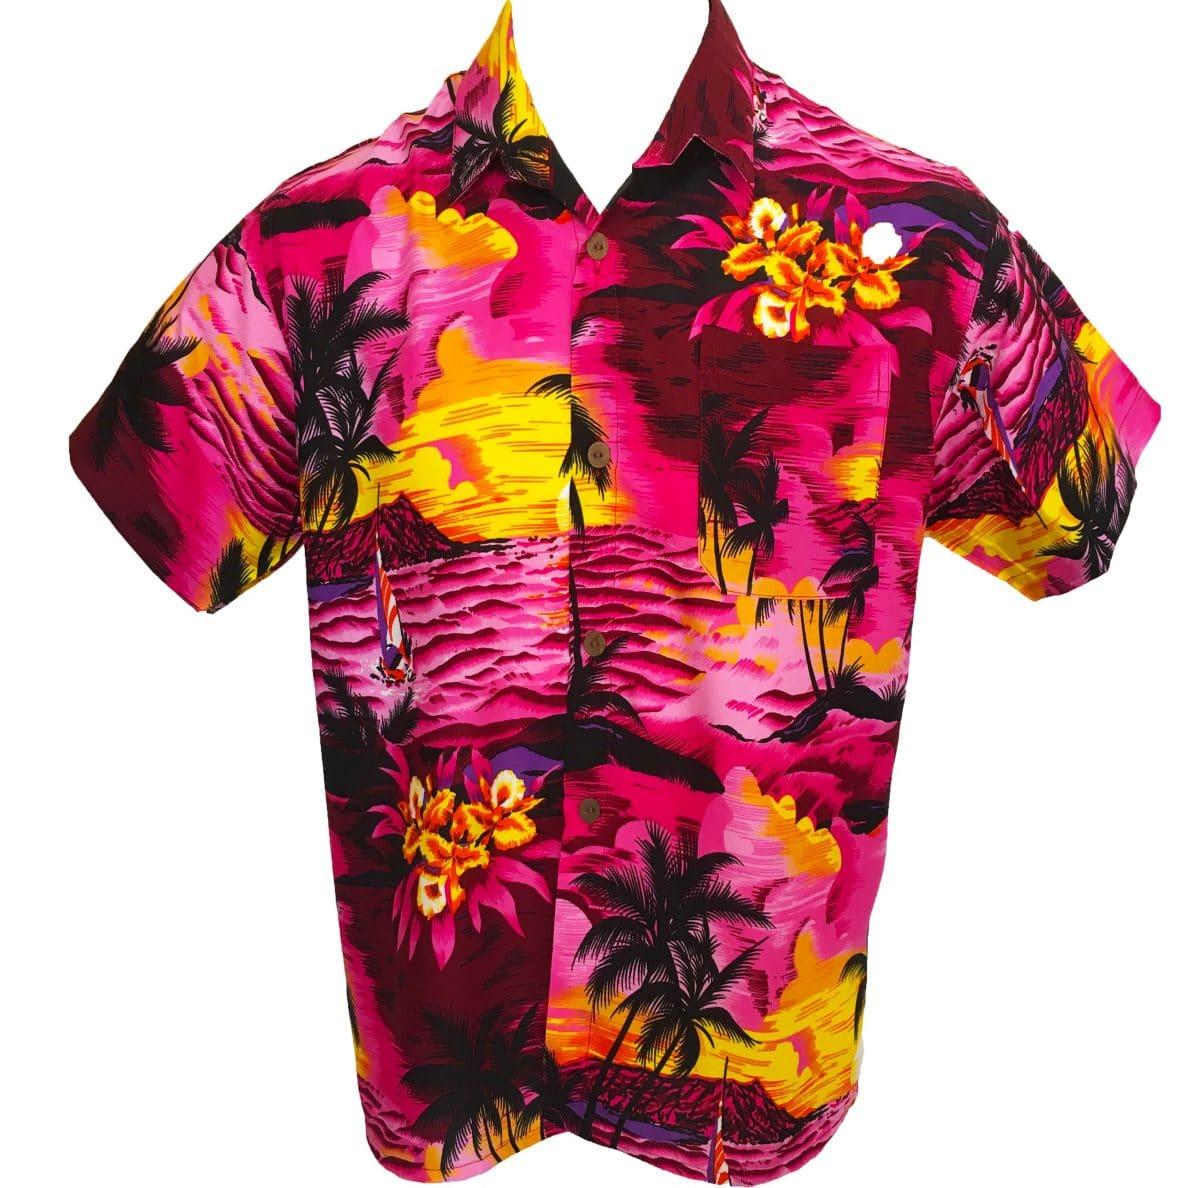 995f7632 Sunset Pink Mens Hawaiian Shirts Party Fancy Dress Casual Rayon ...